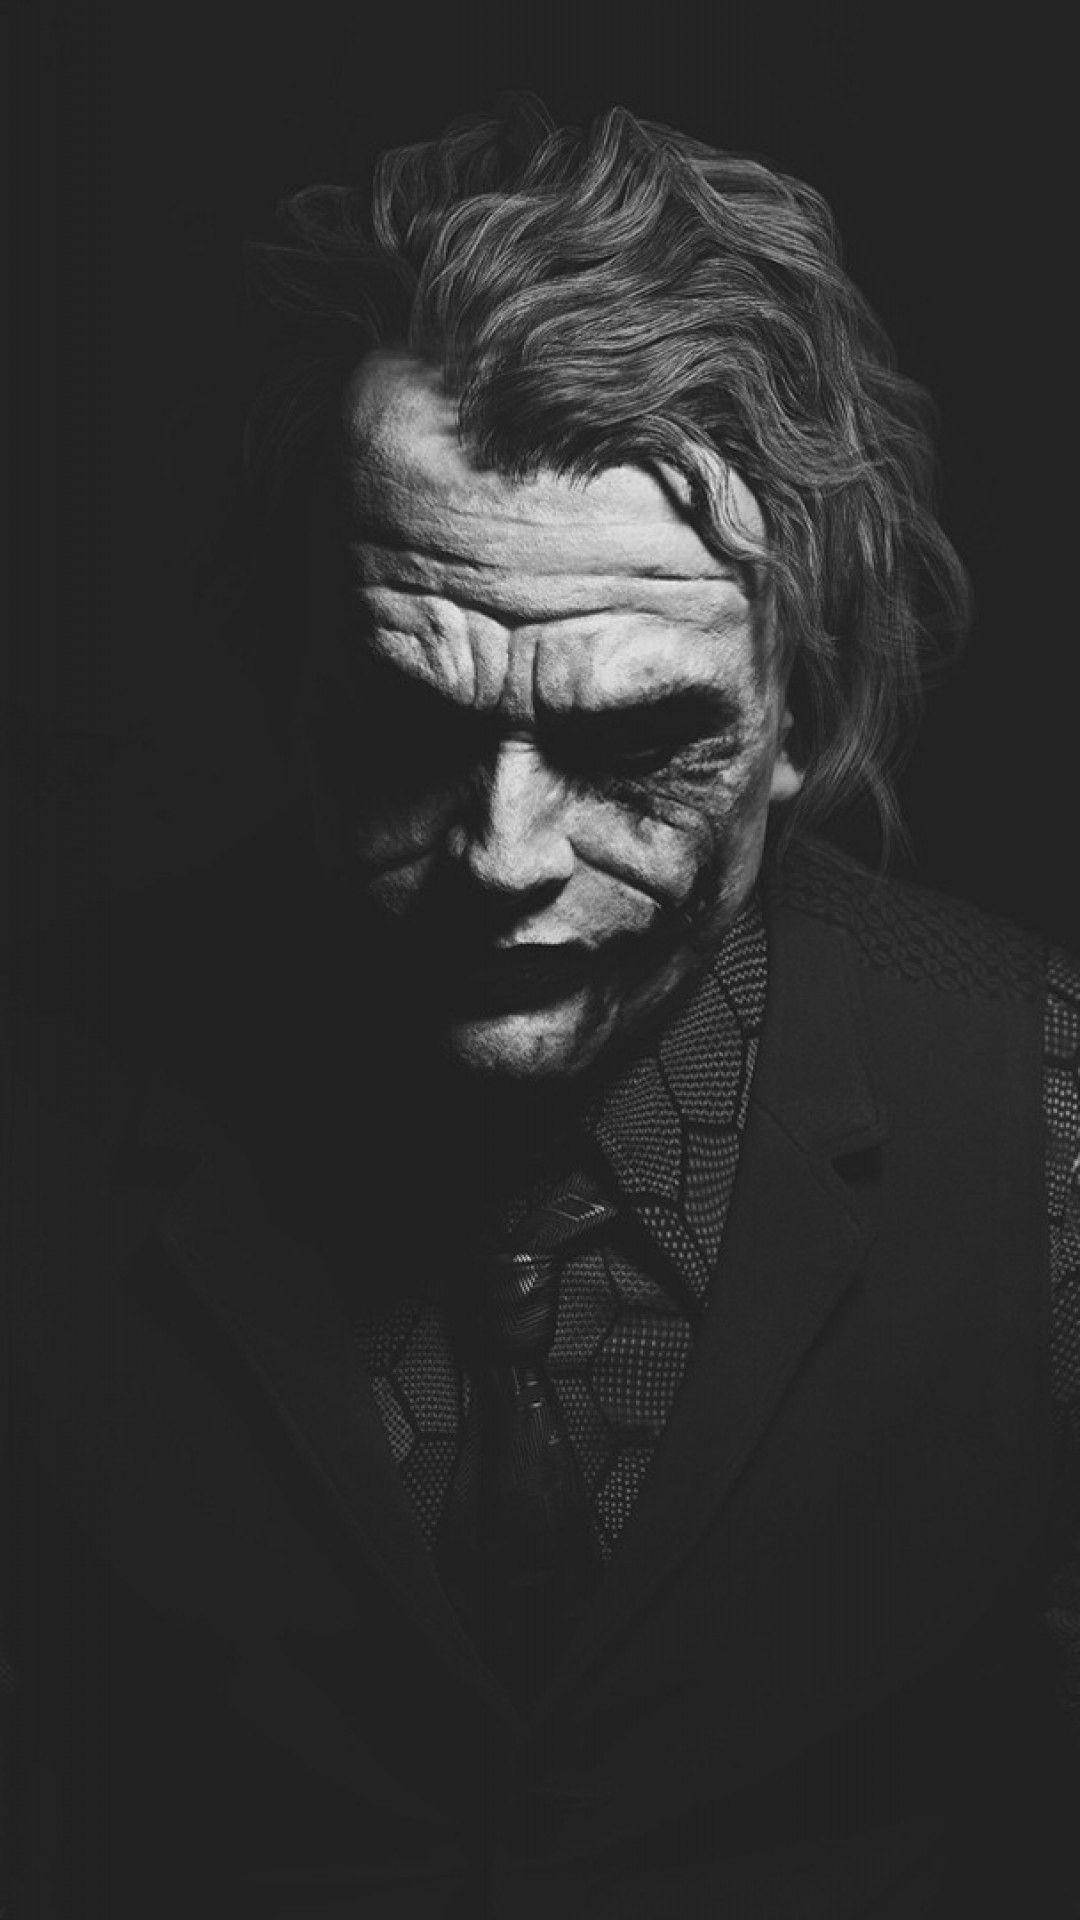 Joker Mobile Wallpapers Top Free Joker Mobile Backgrounds Wallpaperaccess